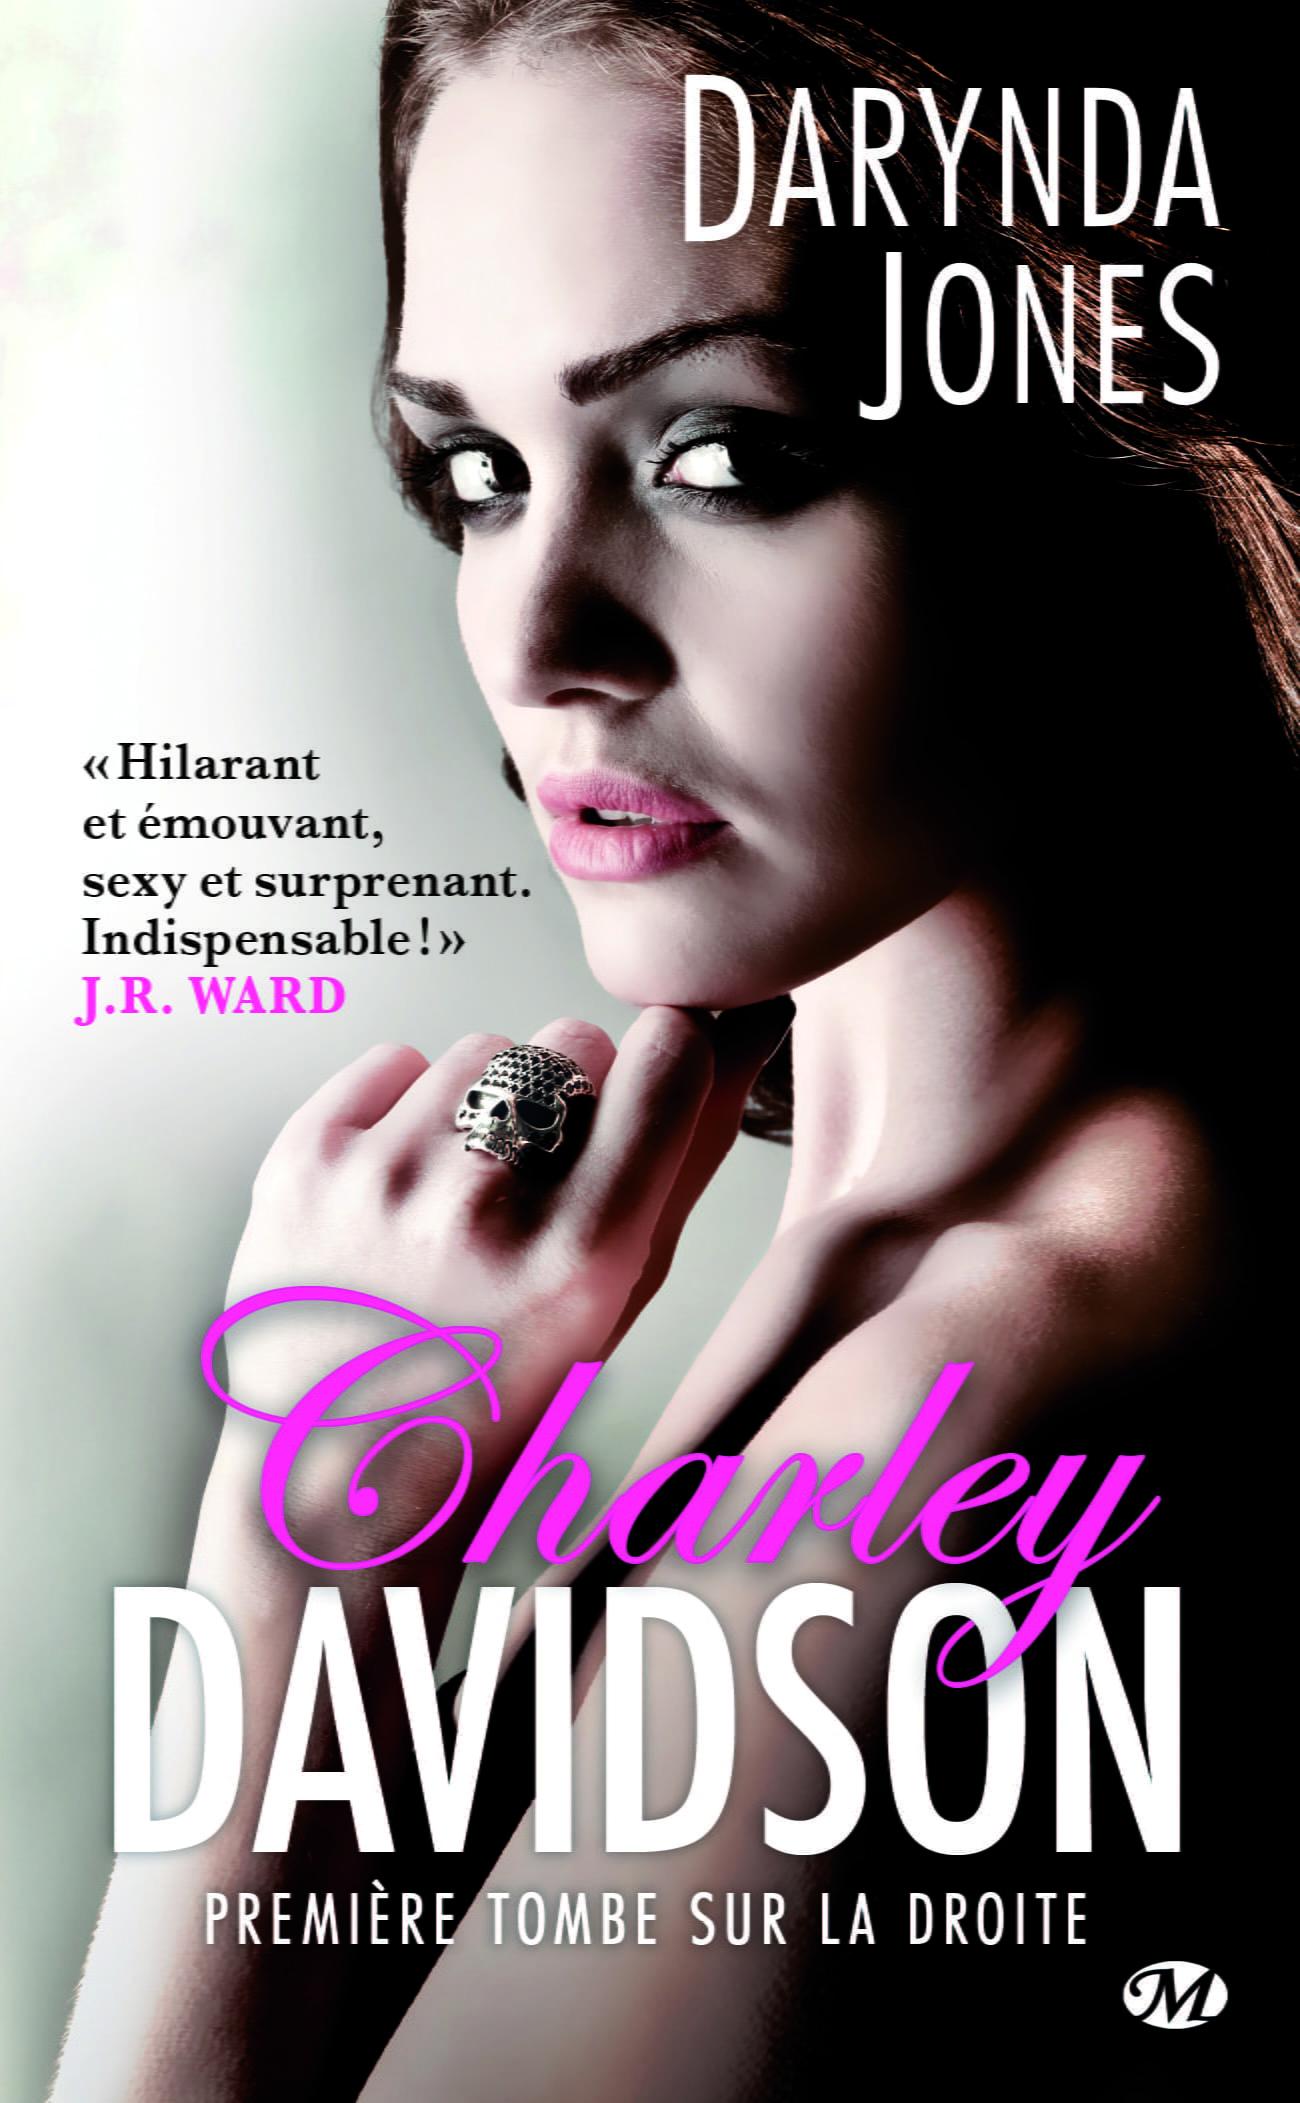 Charley Davidson N°1